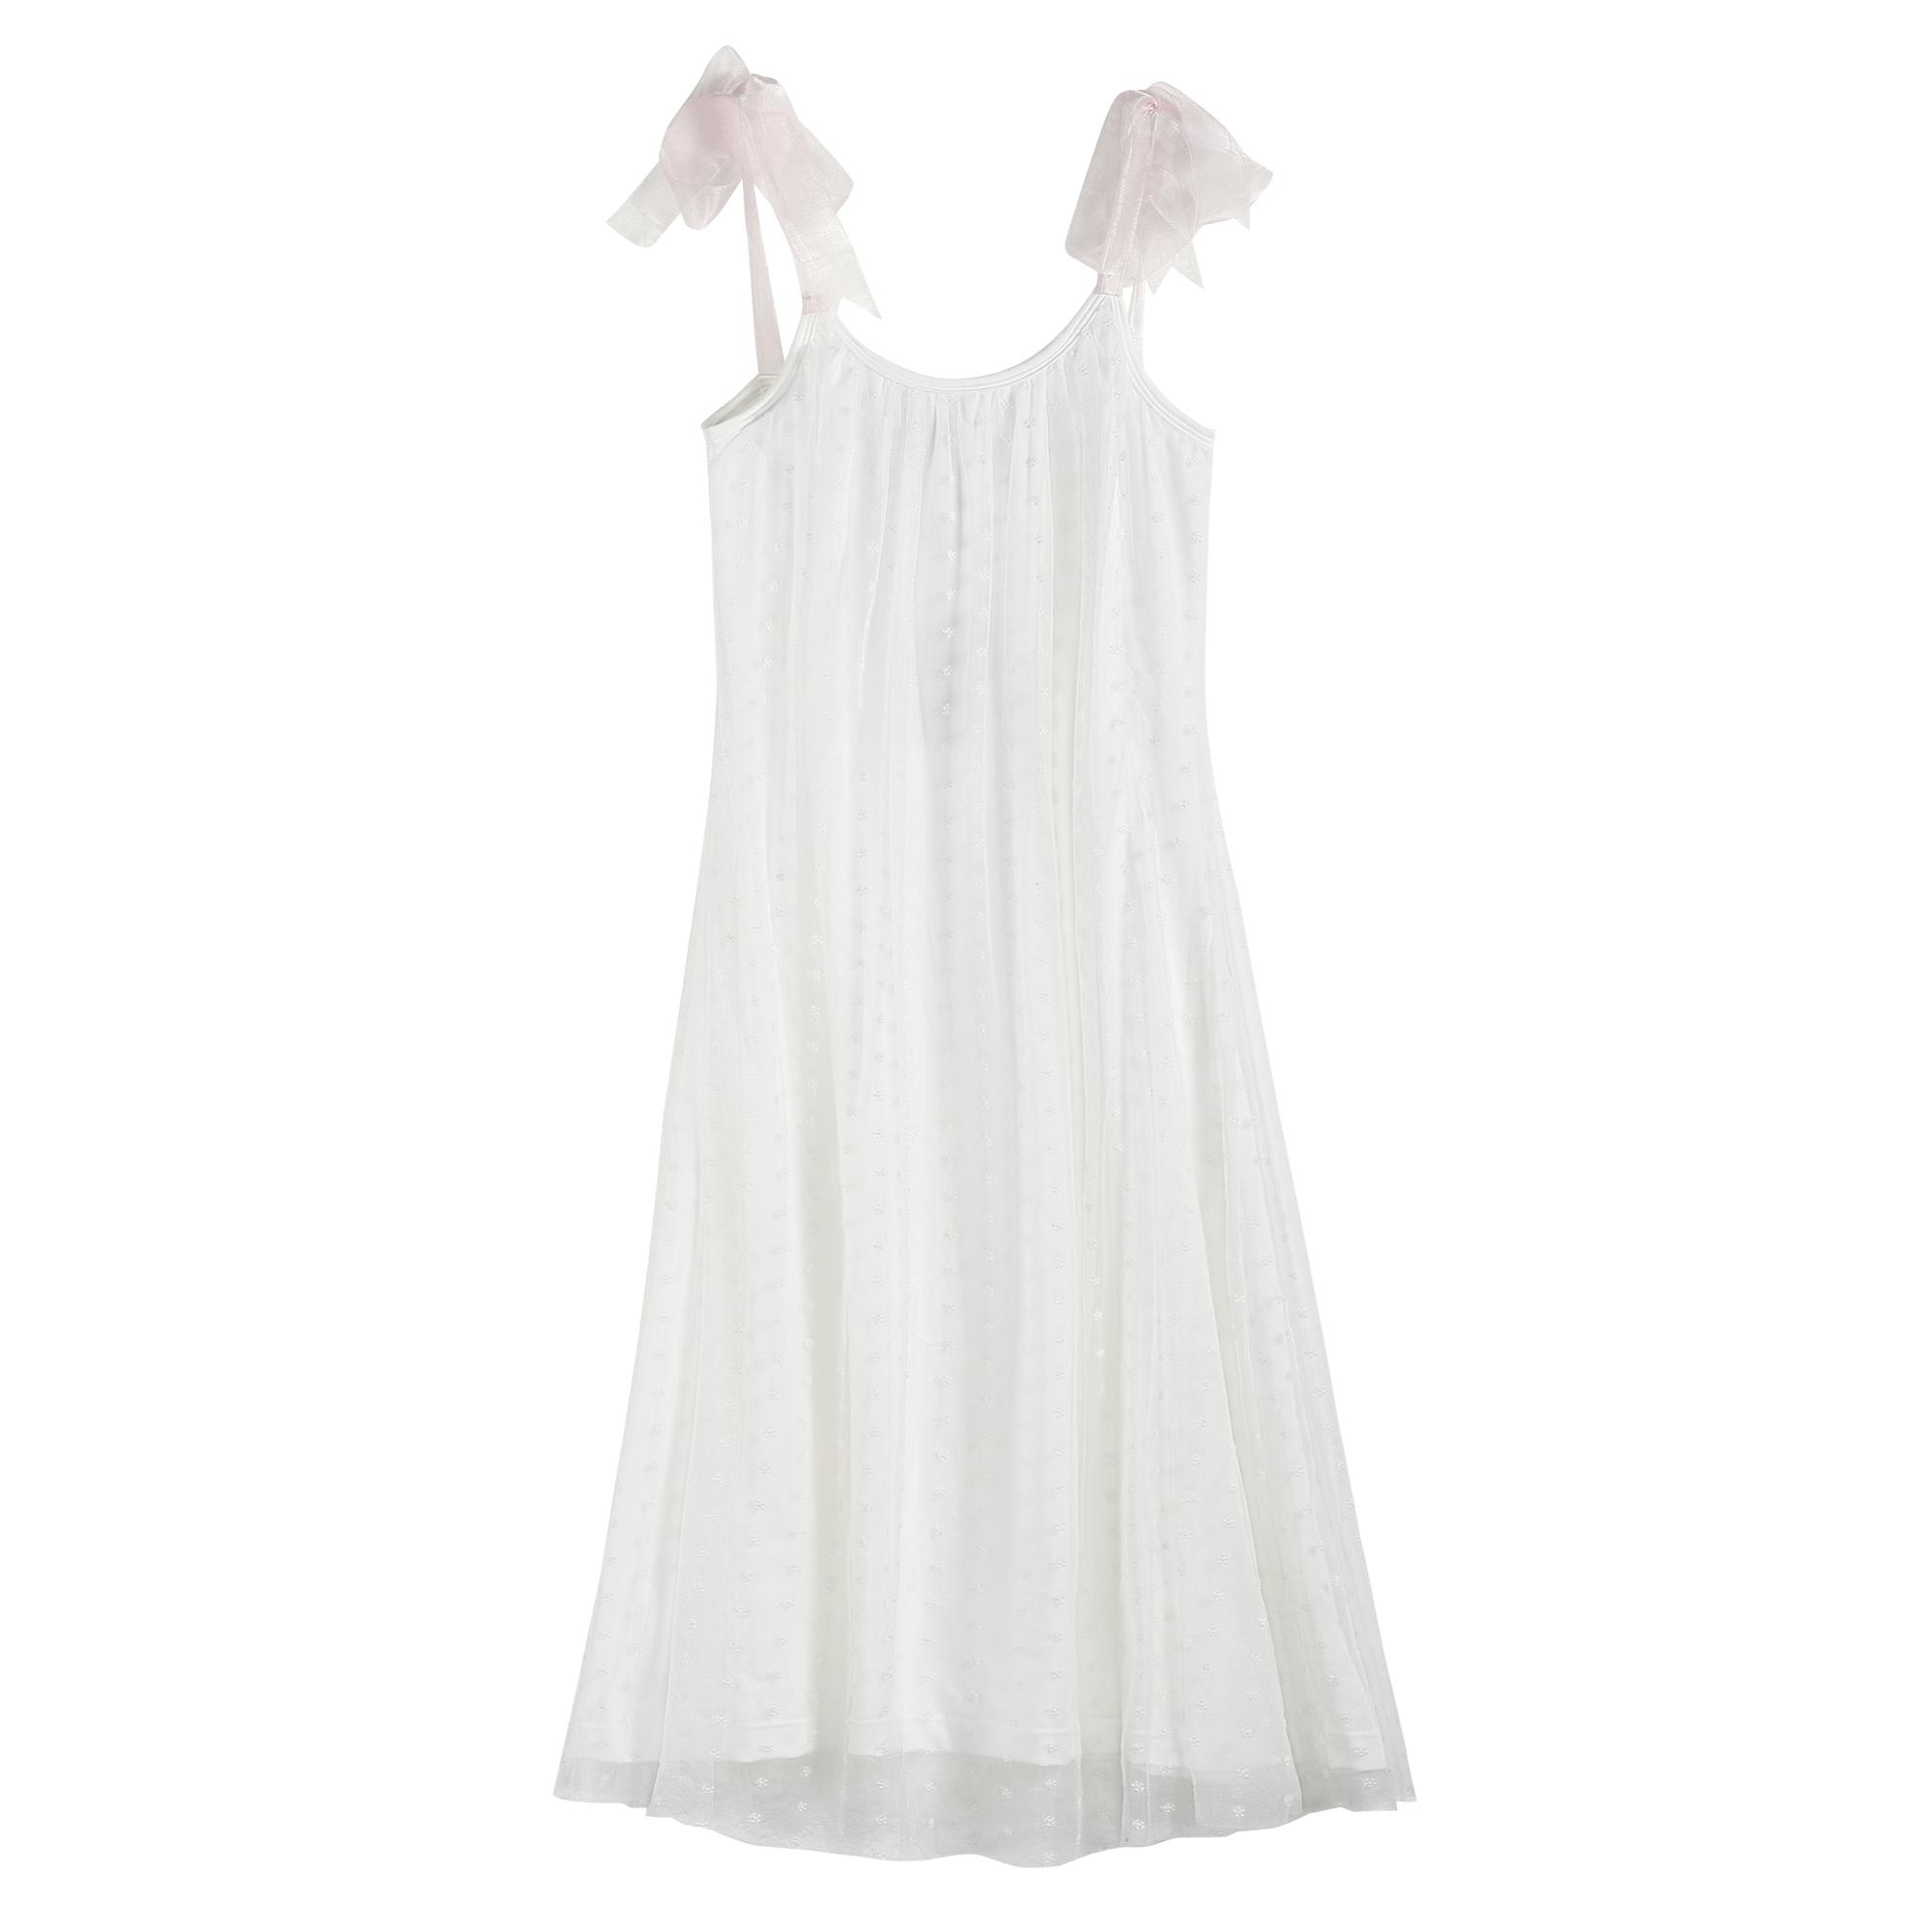 c6fbddfedd ... lightbox moreview · lightbox moreview. PrevNext. (Summer network)Dream  suspenders soft yarn nightdress summer Princess ...